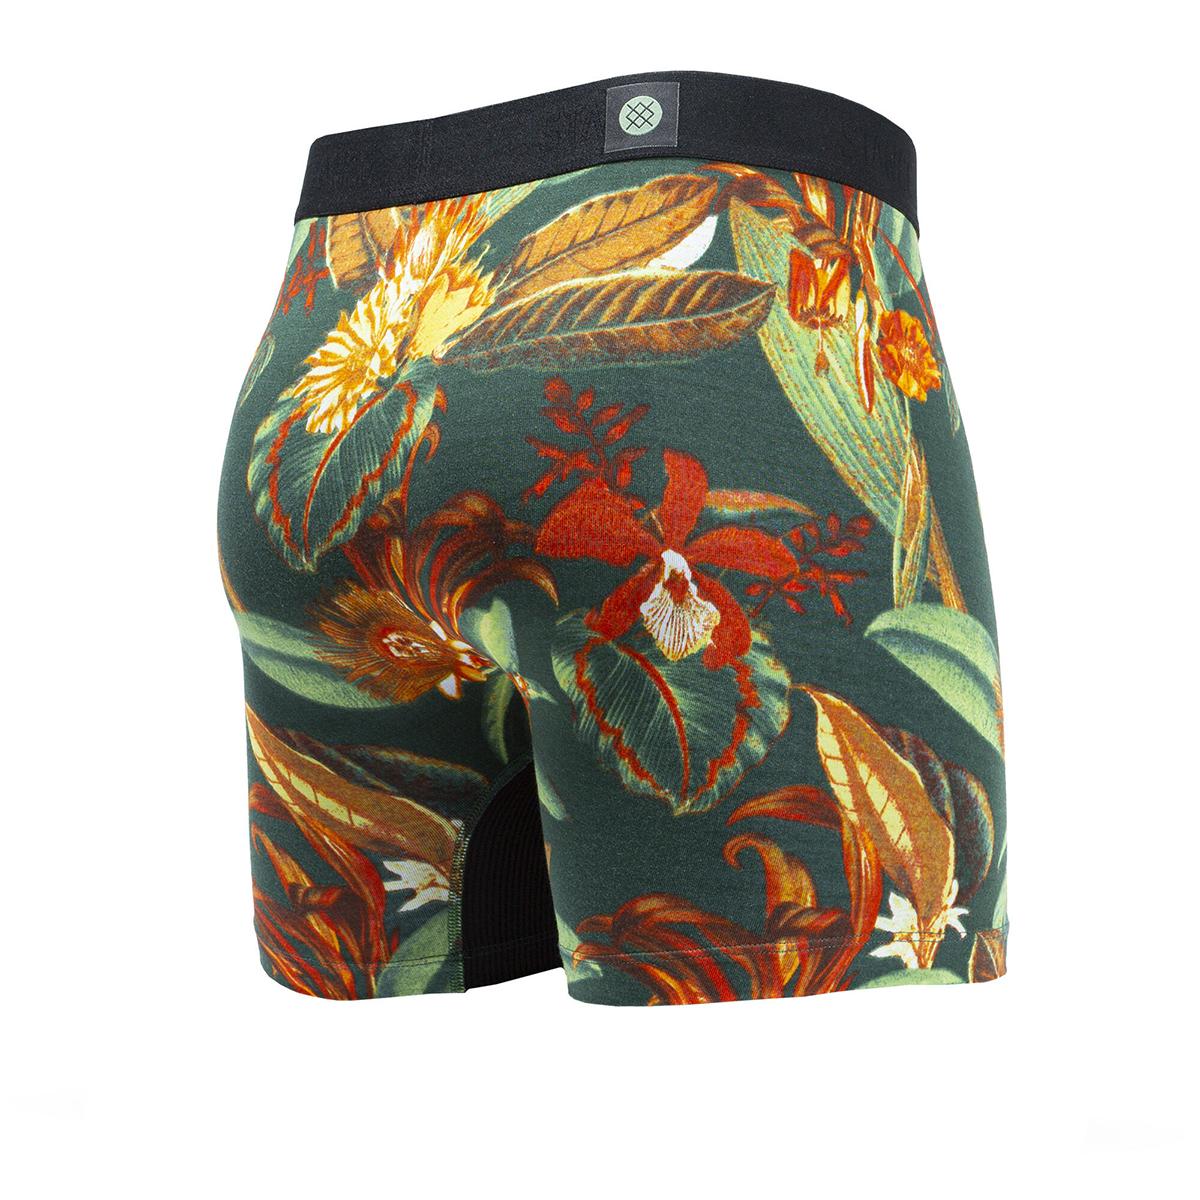 Men's Stance Zecharia Boxer Brief Wholester - Color: Green - Size: S, Green, large, image 2